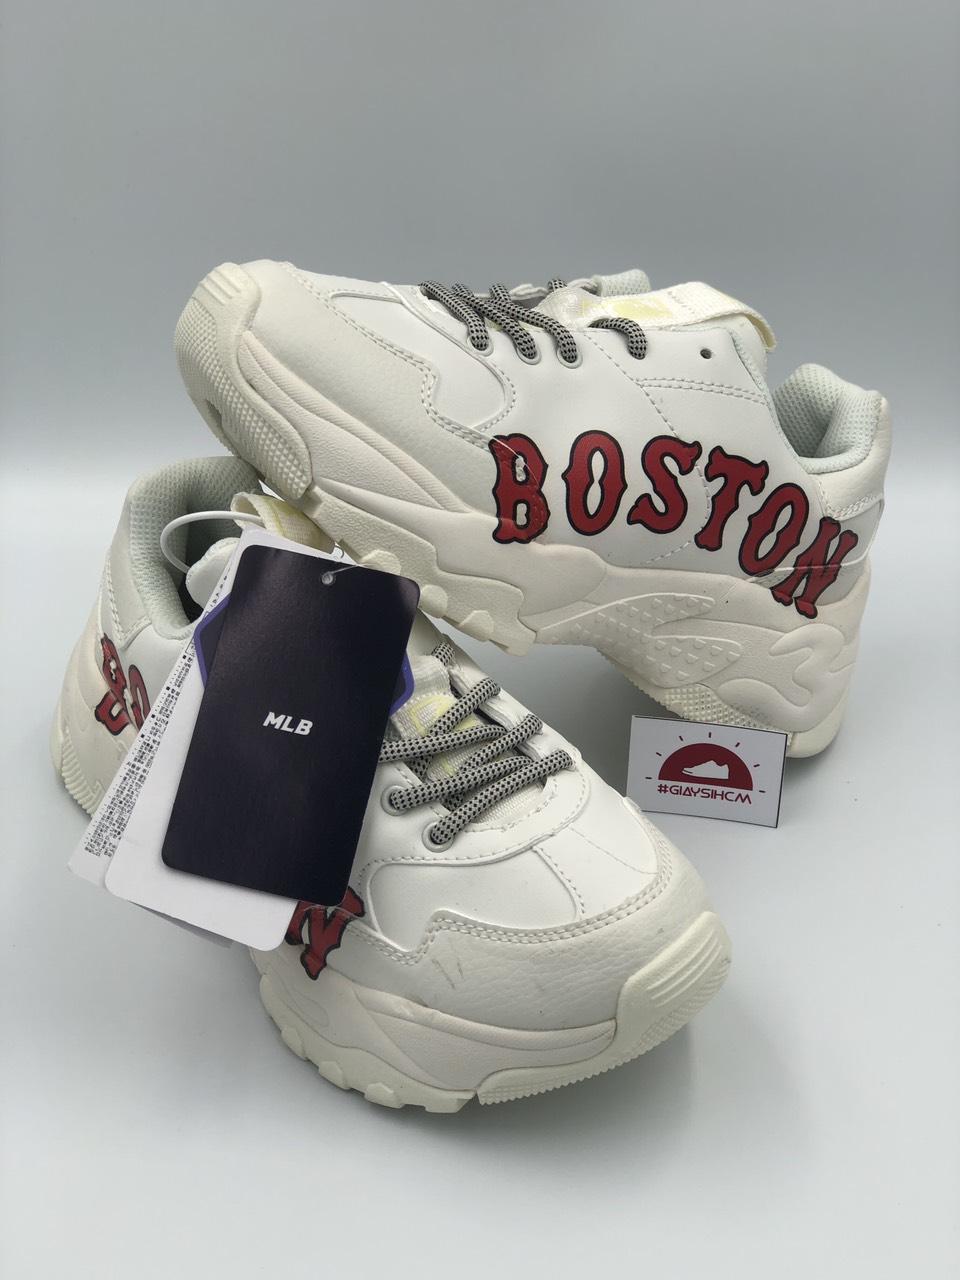 giay-mlb-boston-big-ball-chunky-replica